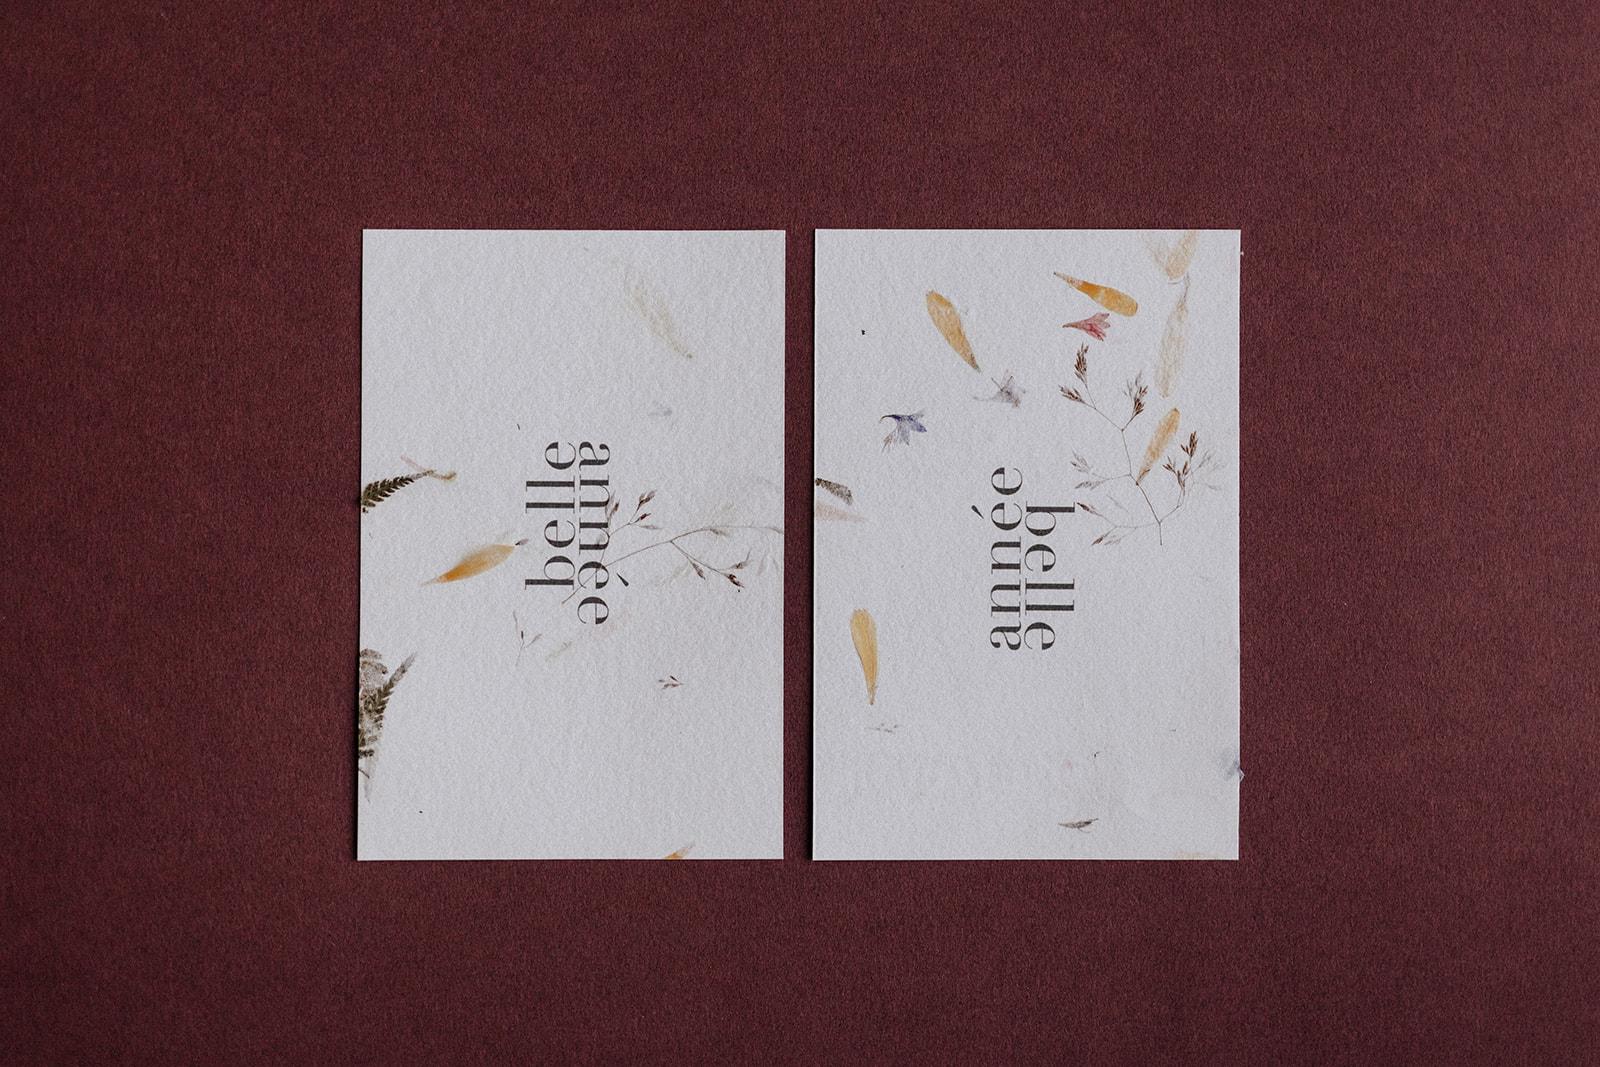 Carte Wabi-sabi [papeterie  | Faire-part mariage]